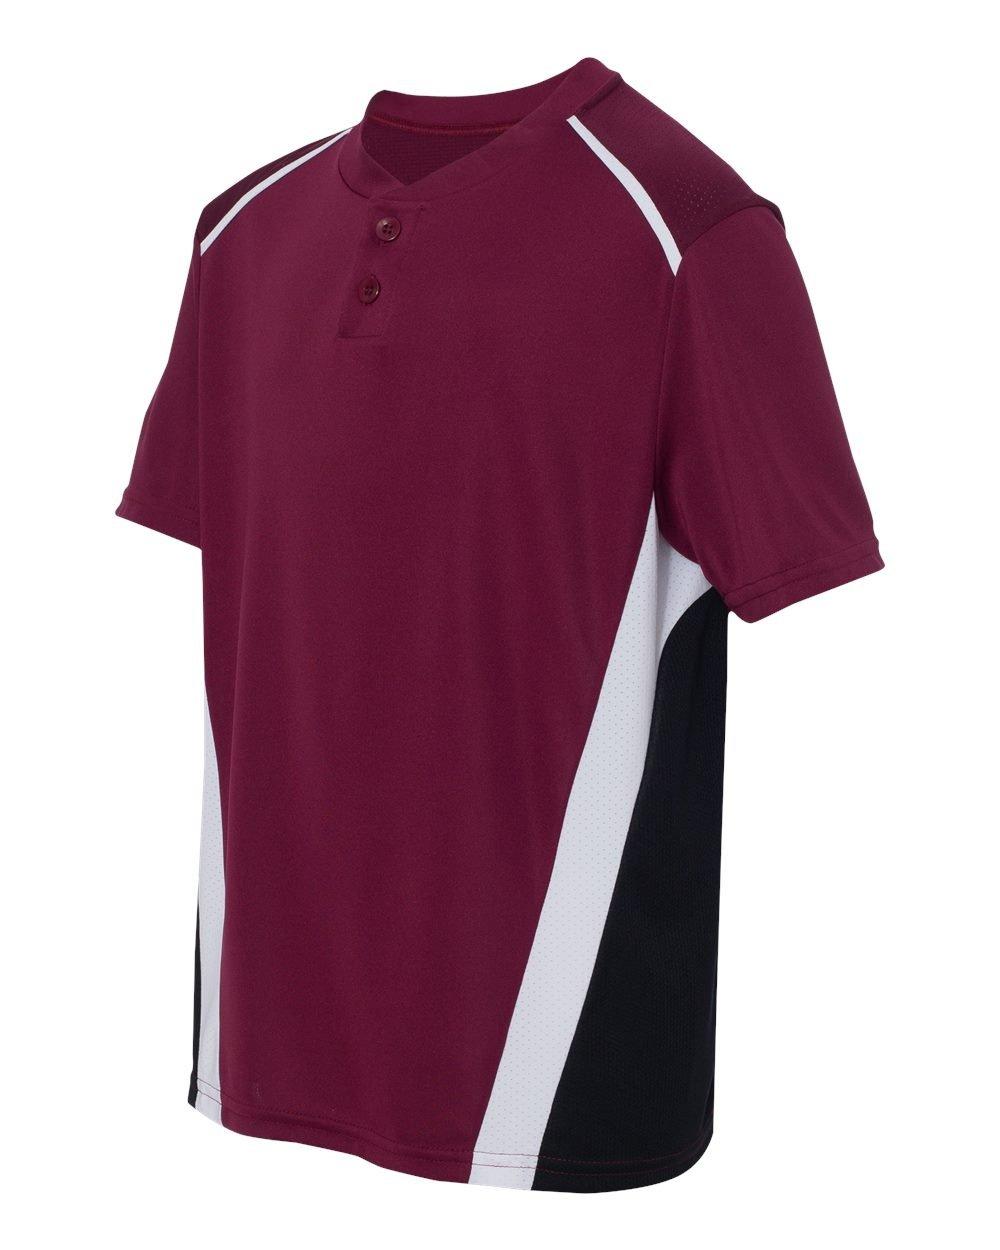 Augusta Sportswear Boys ' RBI野球ジャージー B00E1YUJ52 Medium|マルーン/ブラック/ホワイト マルーン/ブラック/ホワイト Medium